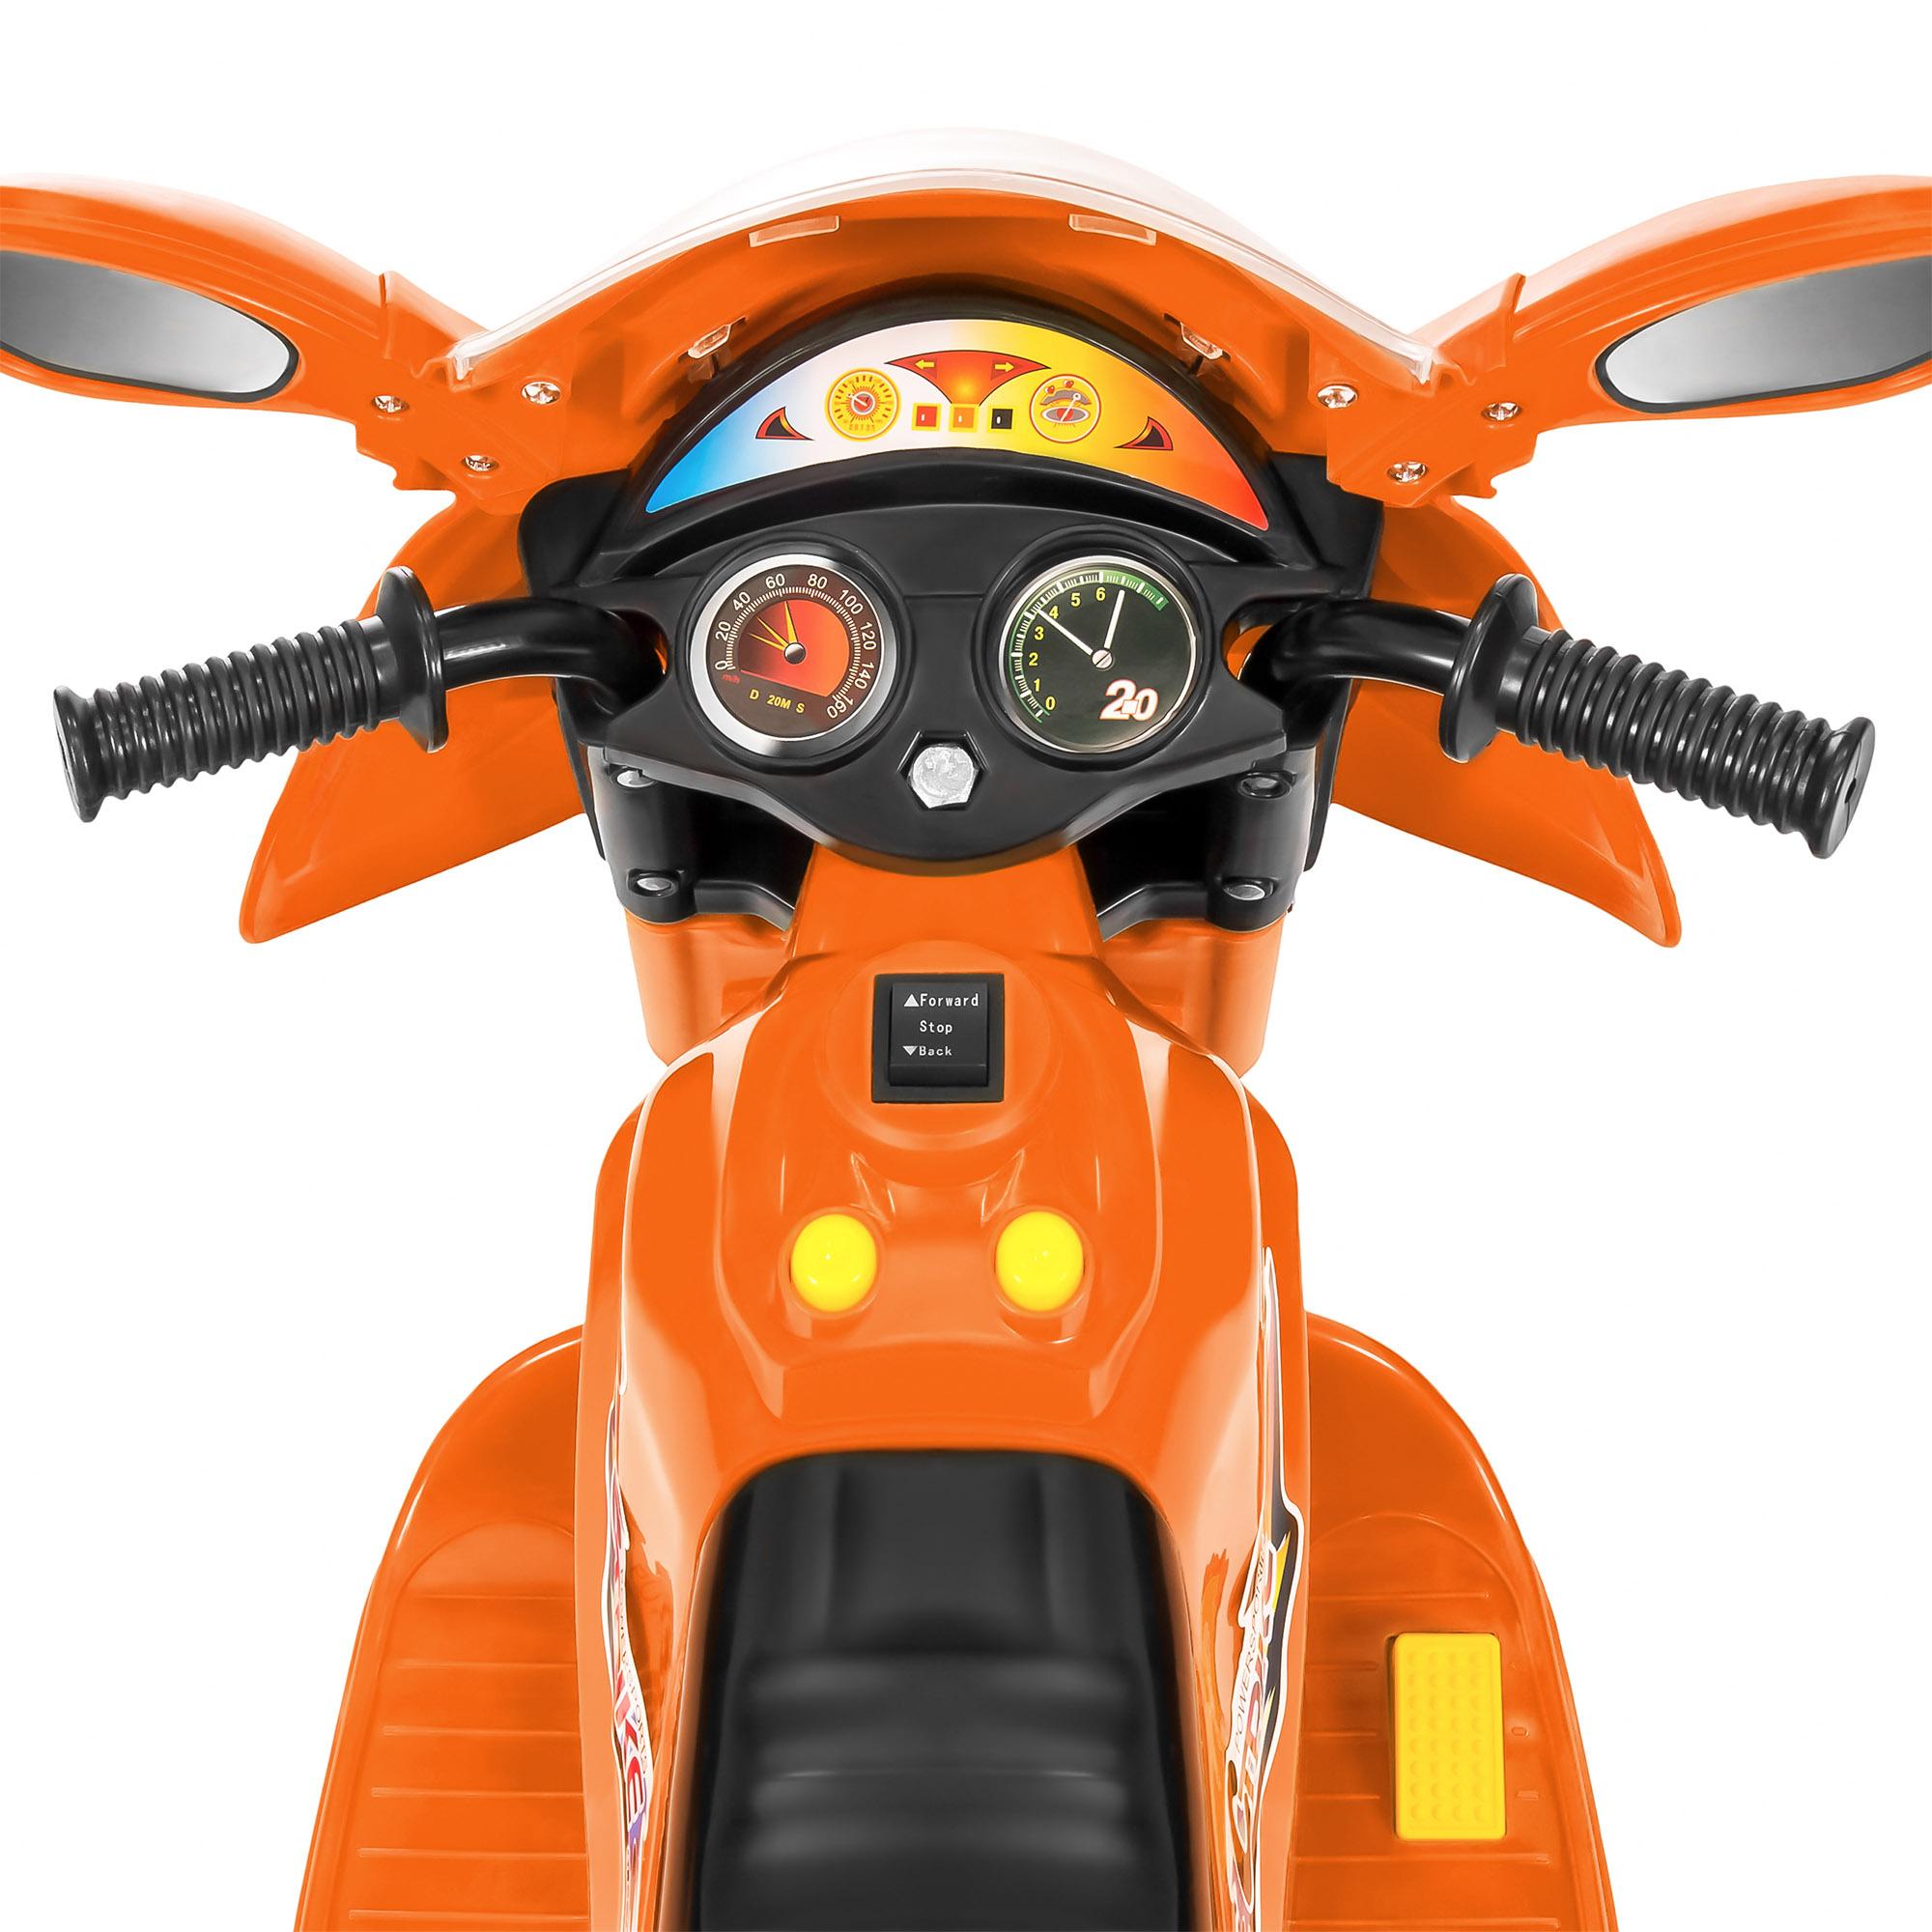 BCP-6V-Kids-3-Wheel-Motorcycle-Ride-On-Toy-w-LED-Lights-Music-Storage thumbnail 23